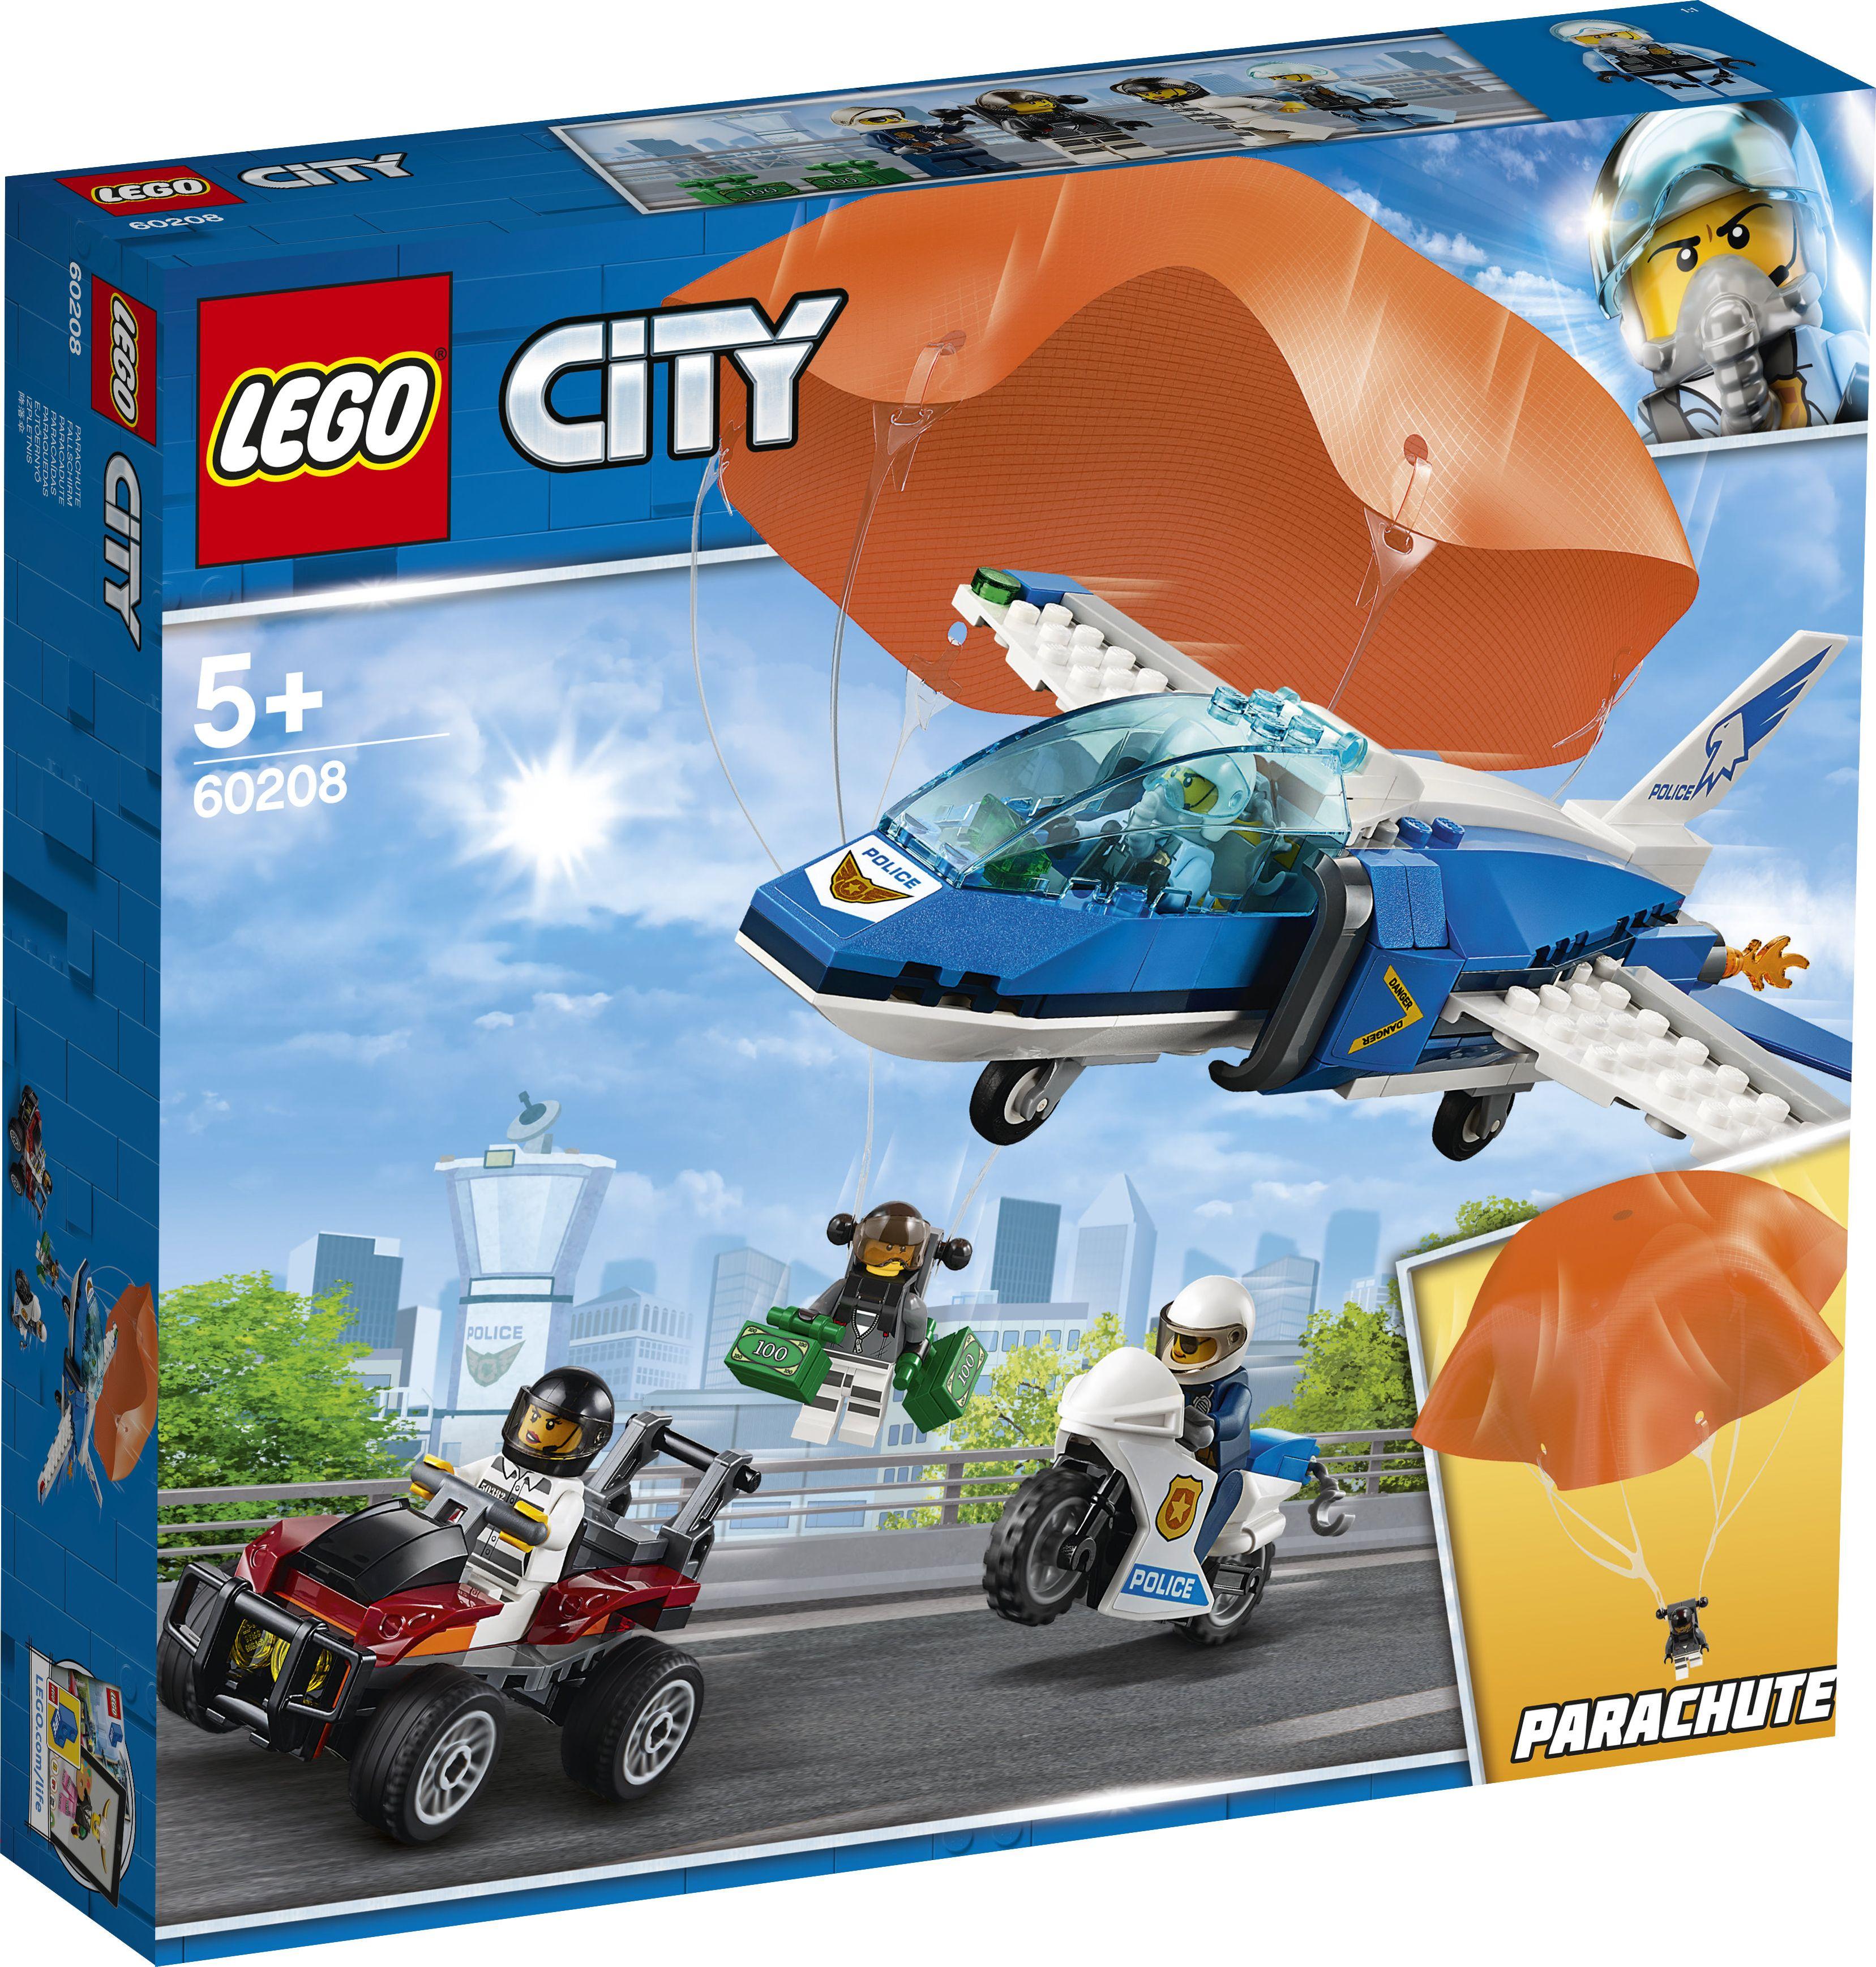 LEGO City 60208 Sky Police Parachute Arrest LEGO konstruktors